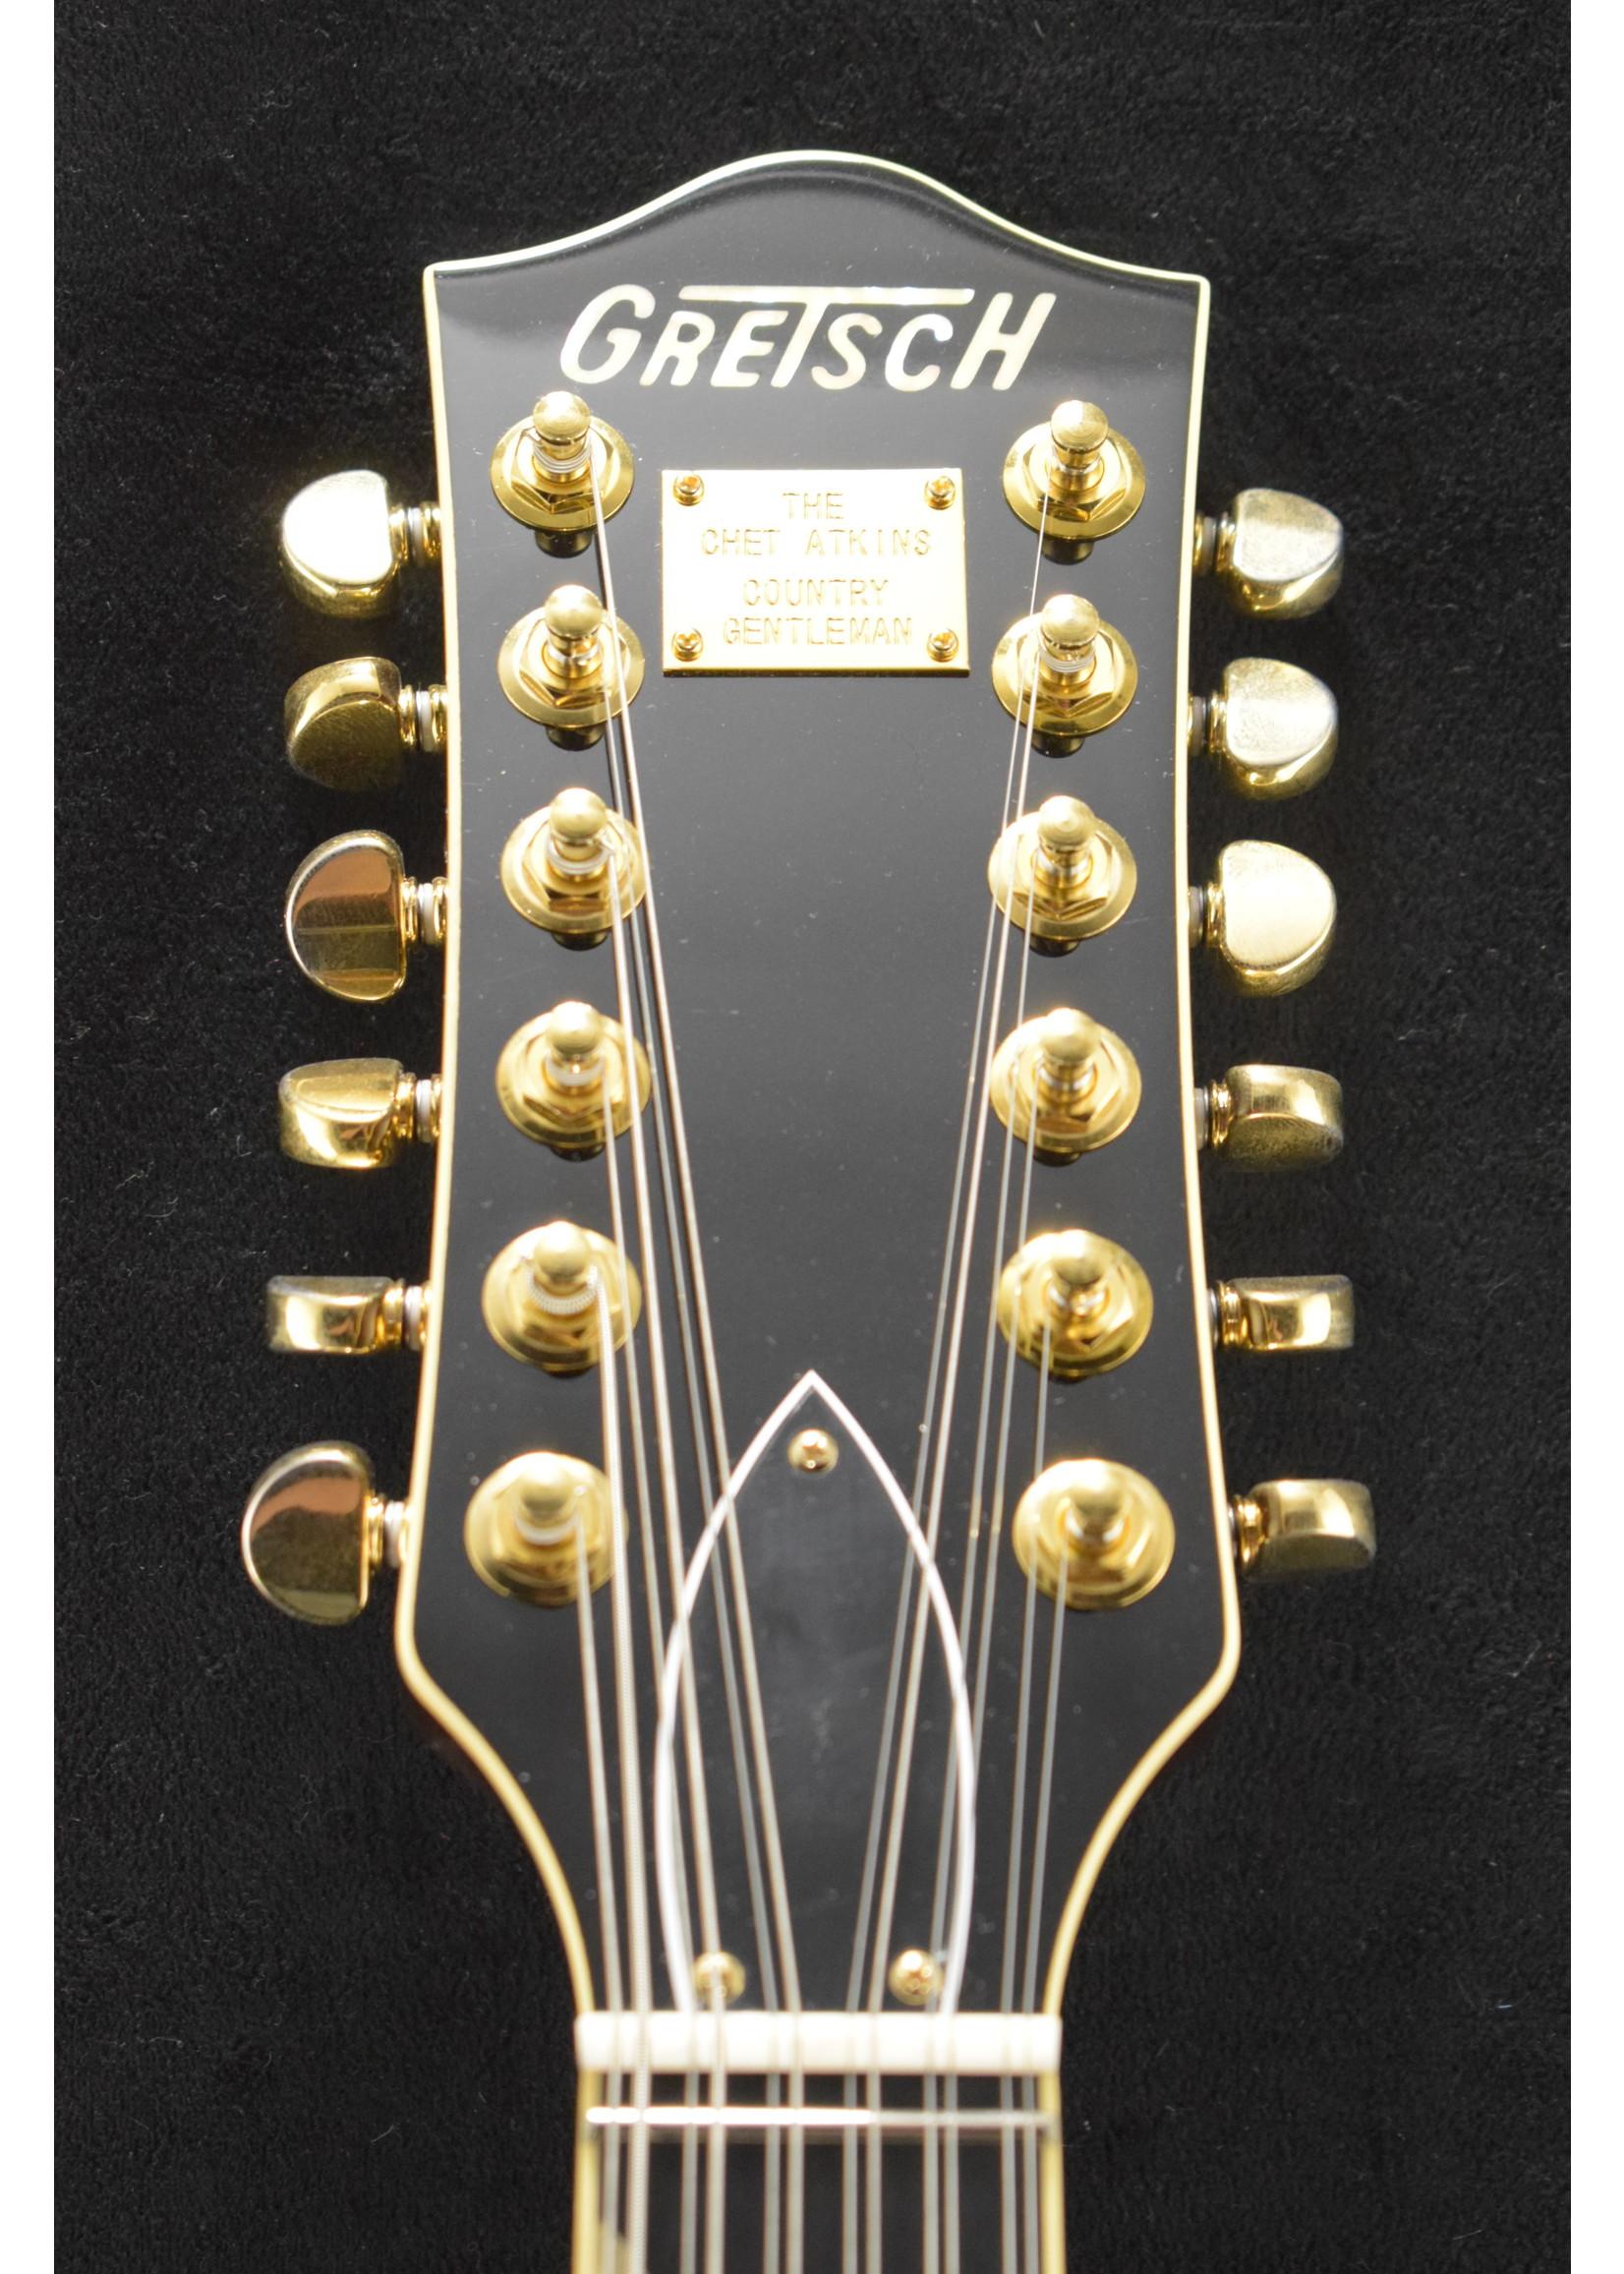 Gretsch Gretsch G6122-6212 VS '62 Chet Atkins Country Gentleman 12-String Walnut Stain